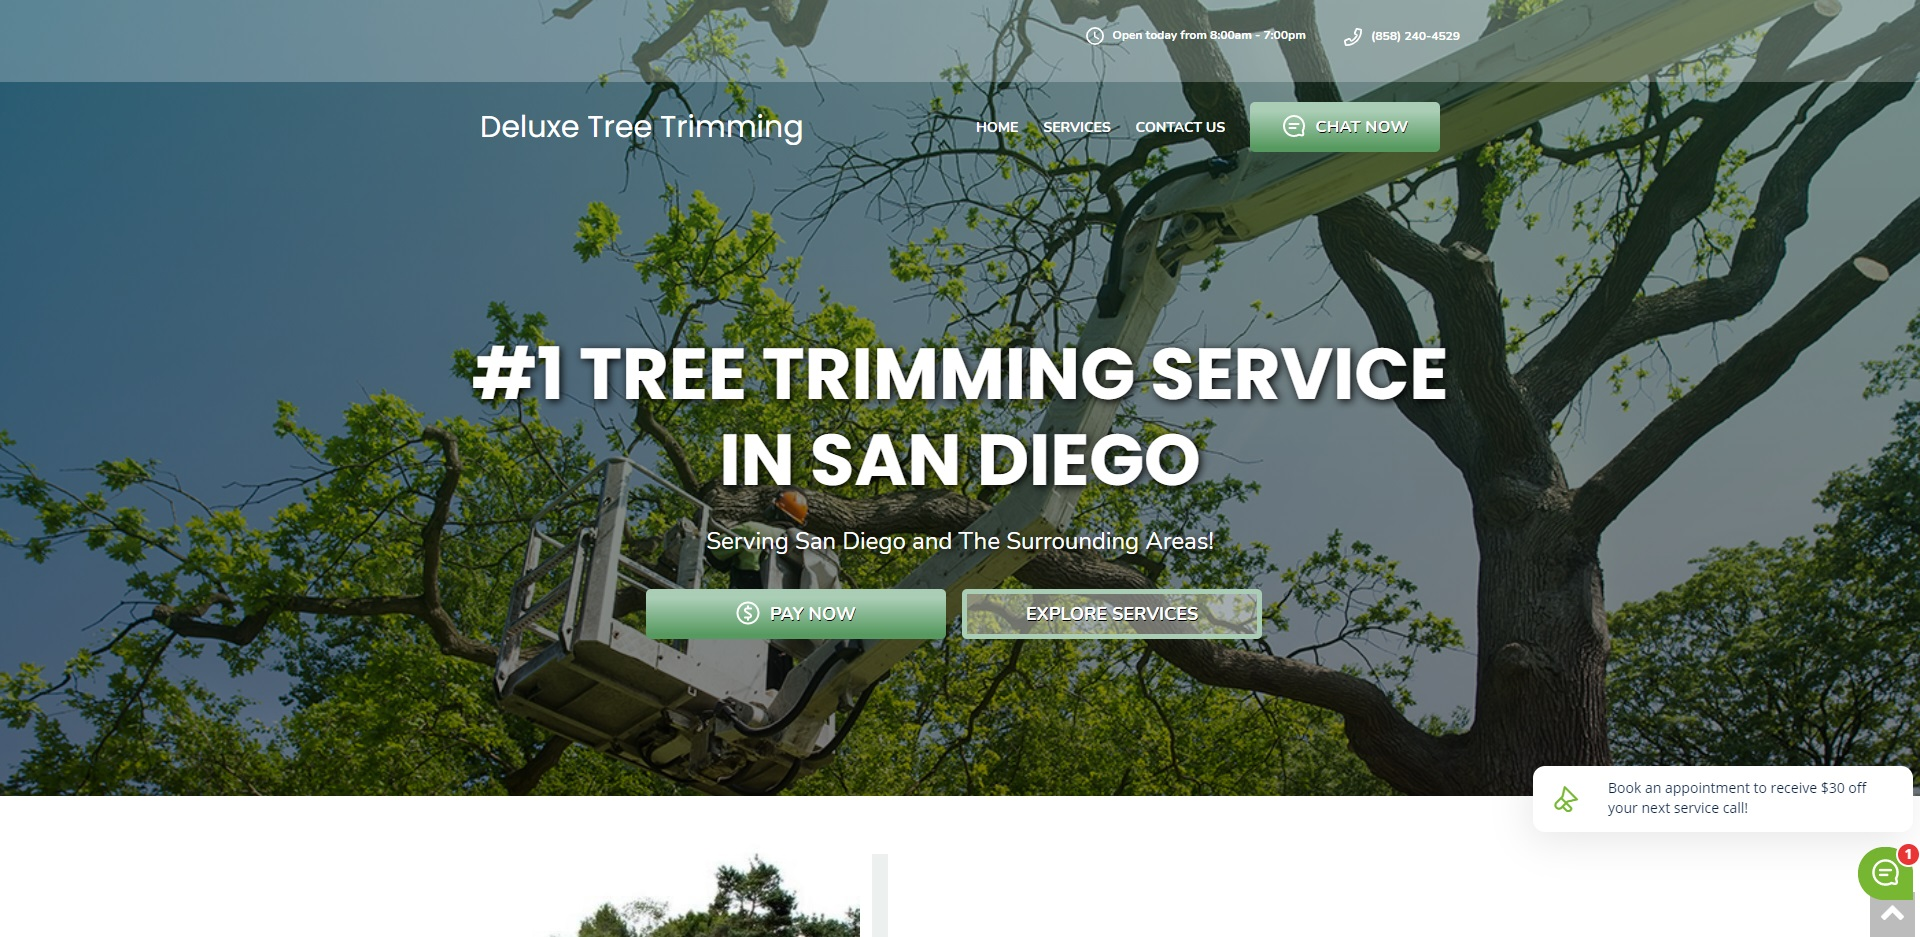 5 Best Tree Services in San Diego